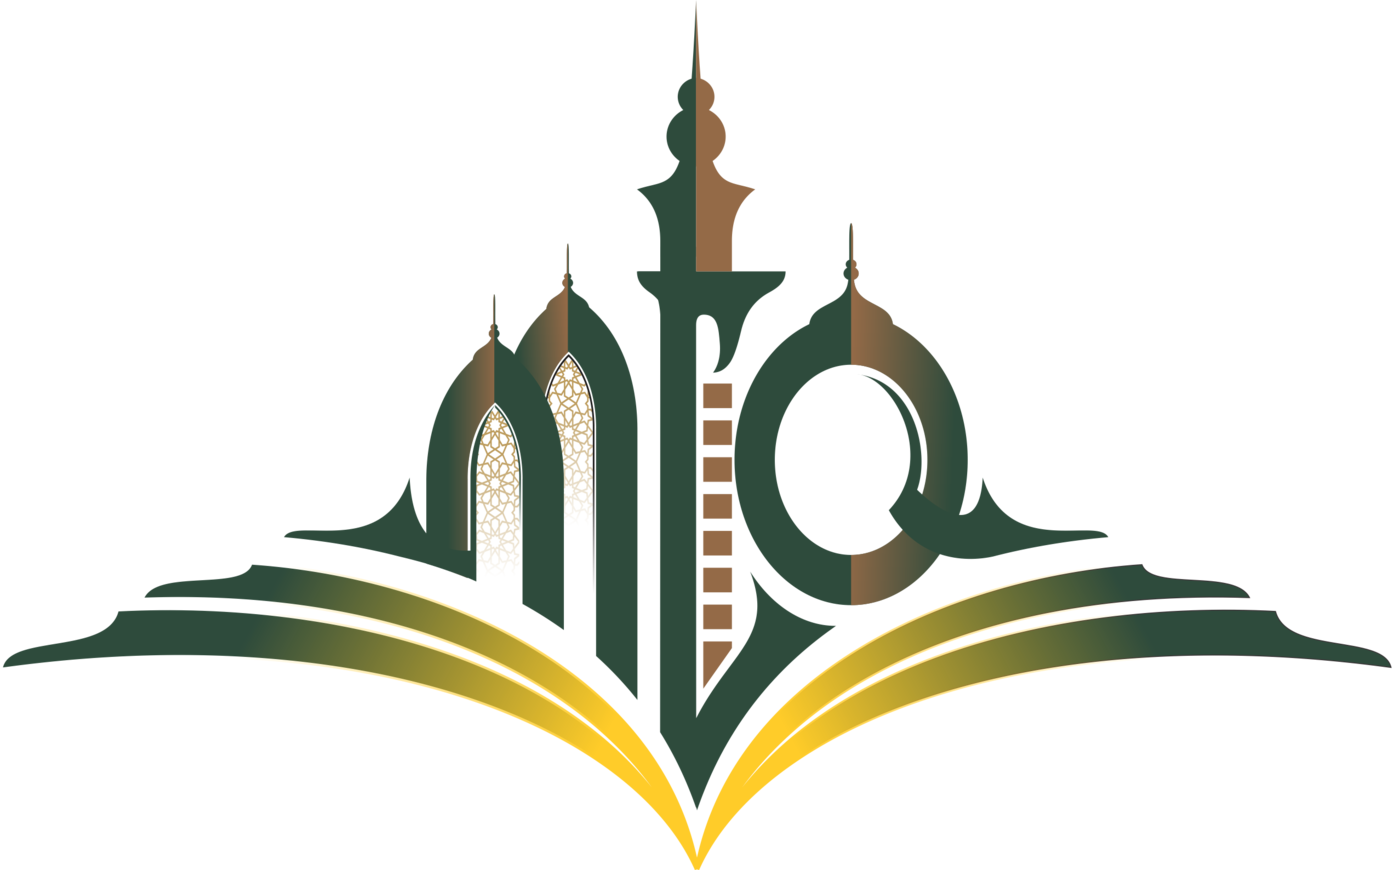 Musabaqah Tilawatil Qur'an _ logo Desain logo, Desain